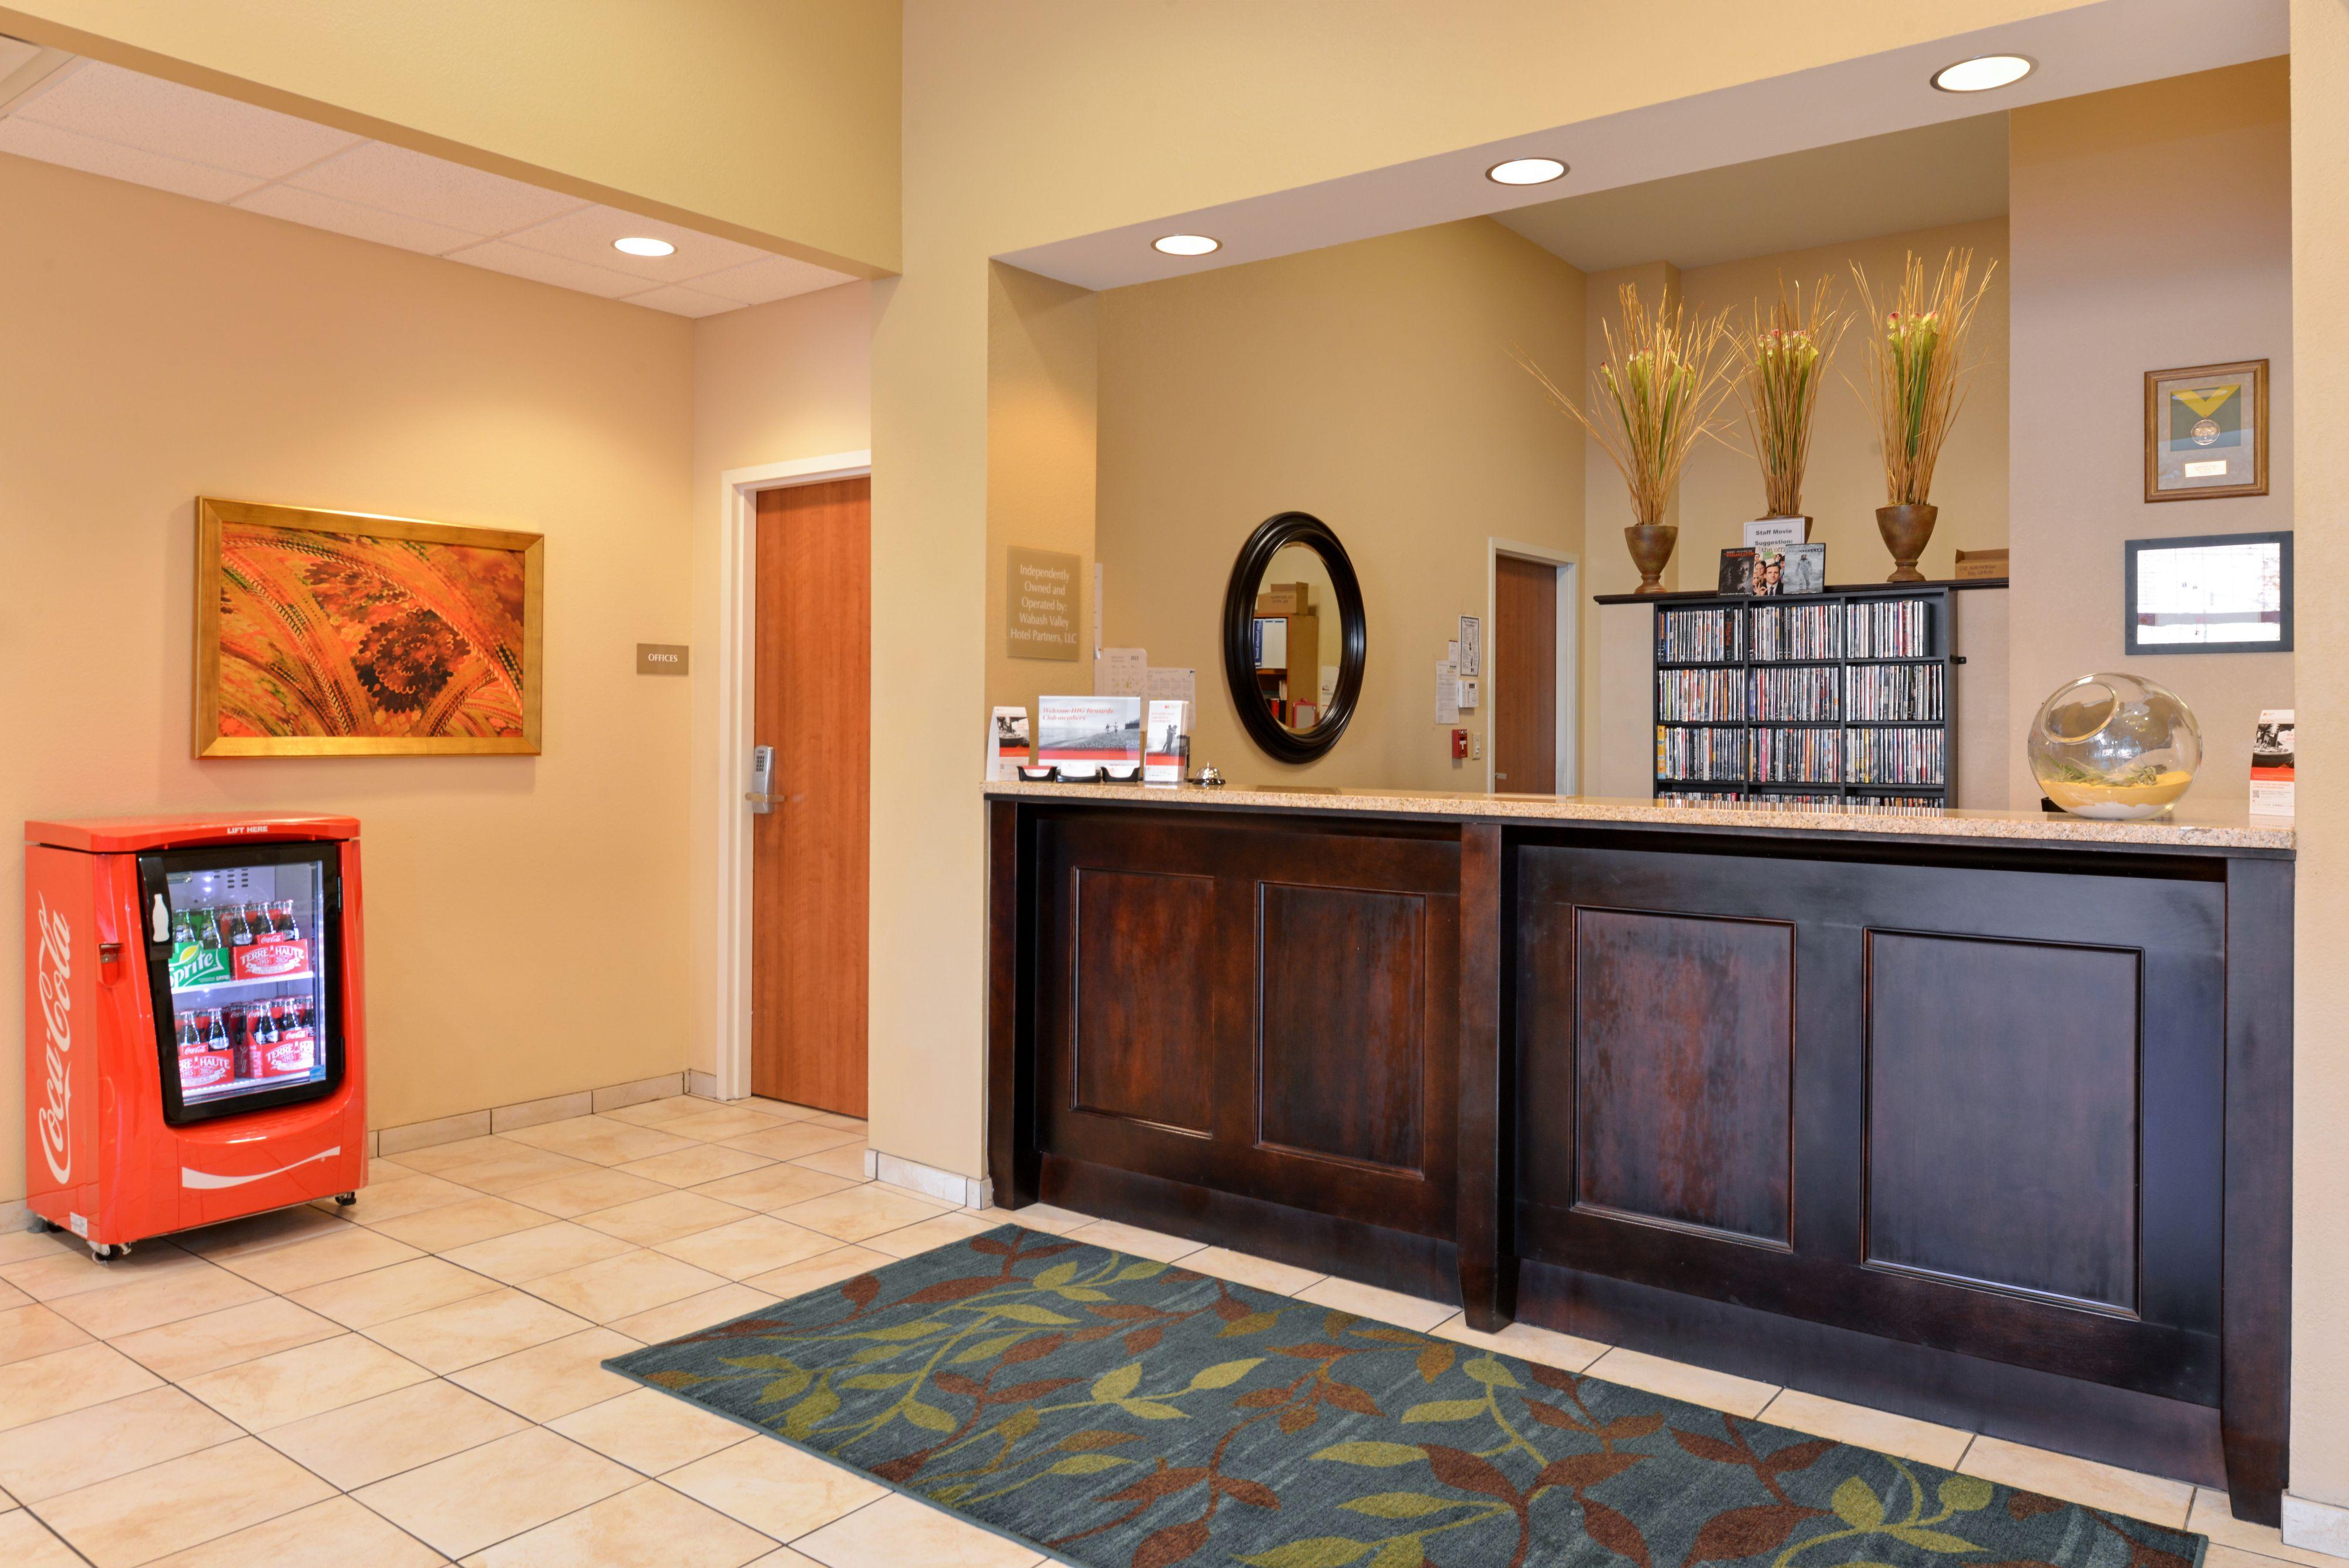 Candlewood Suites Terre Haute image 6